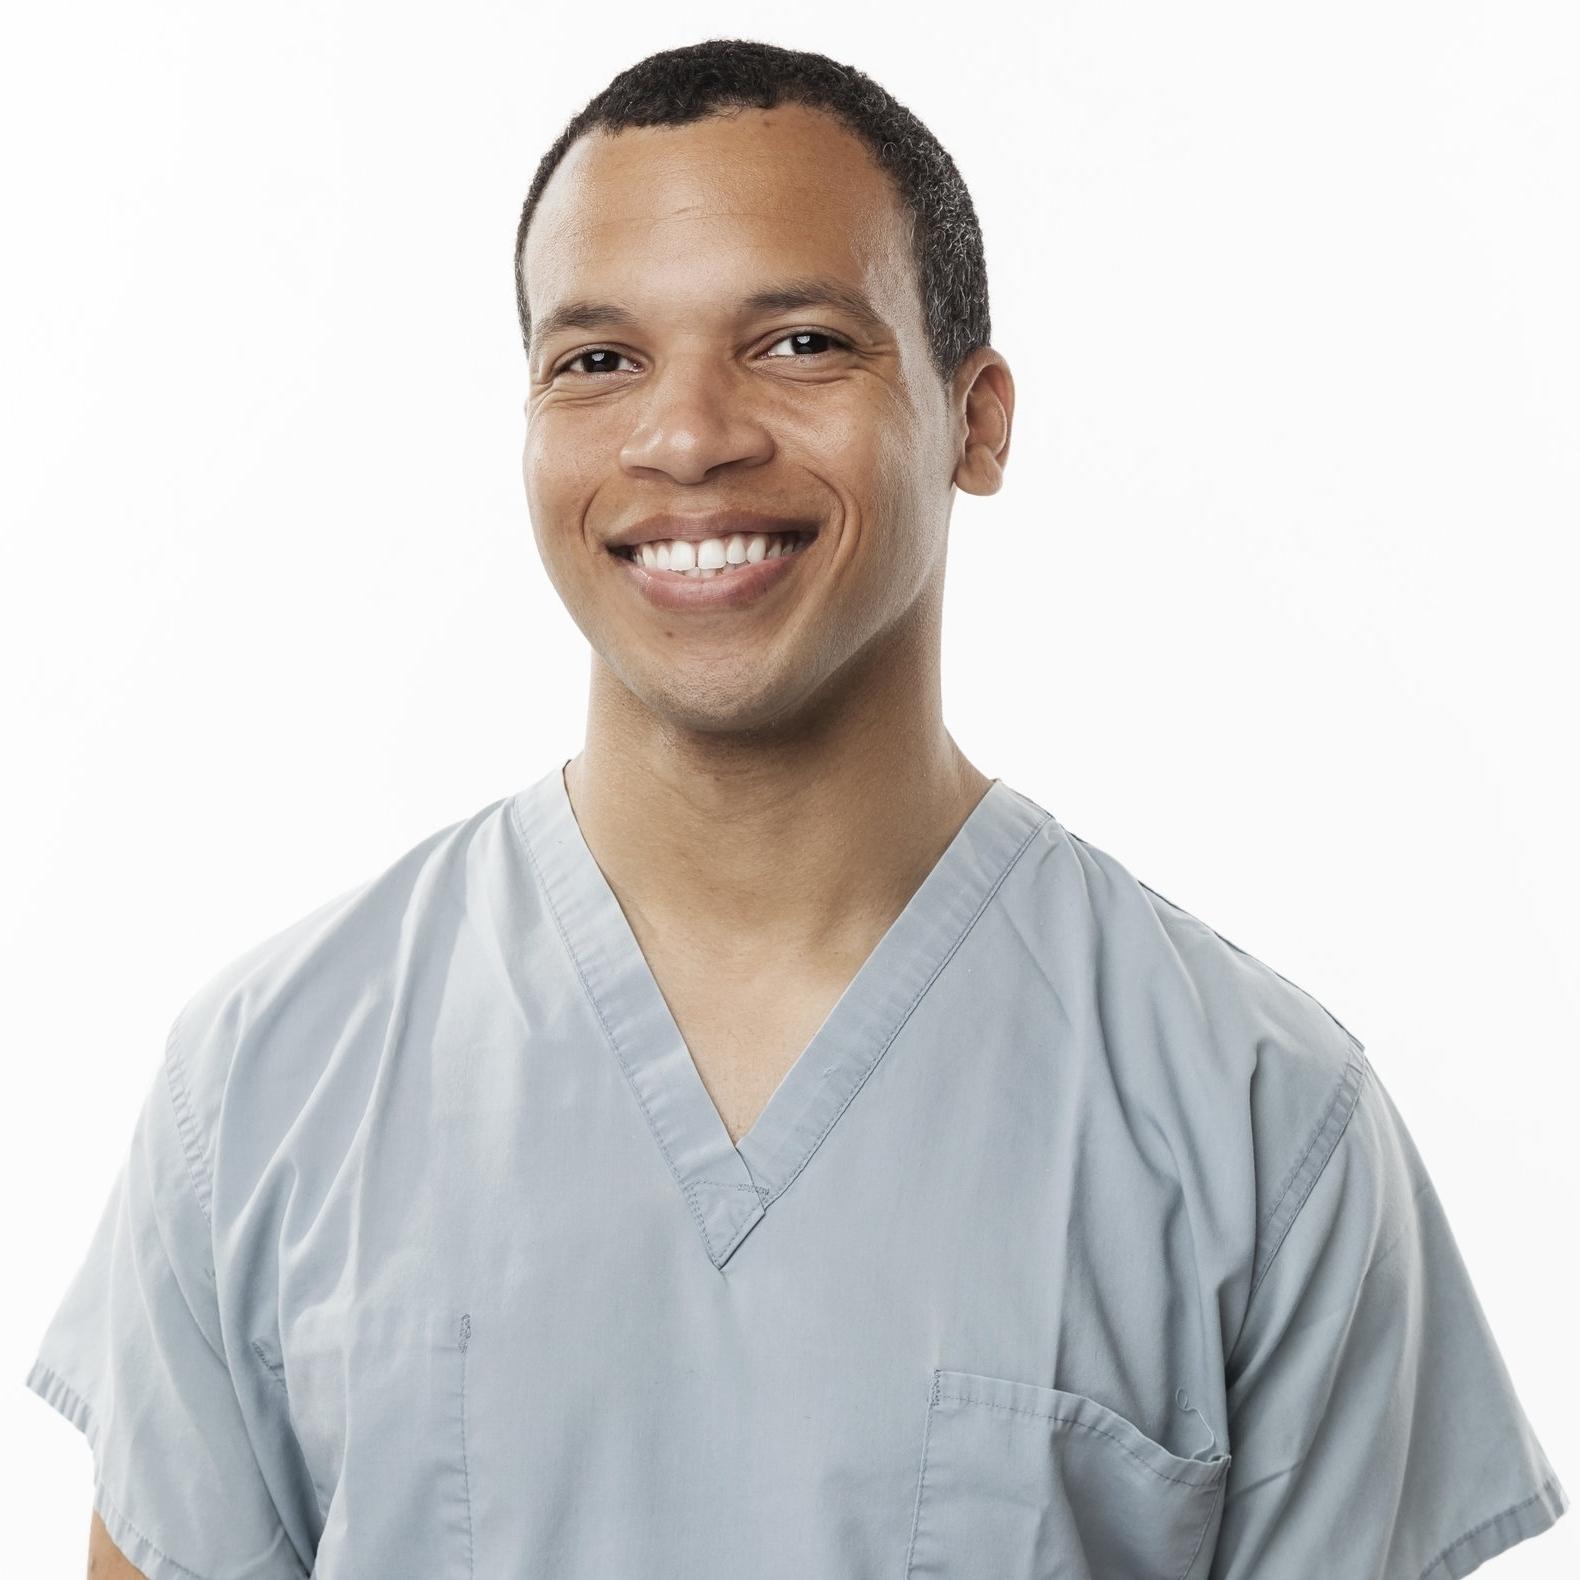 Dr. Jones profile photo